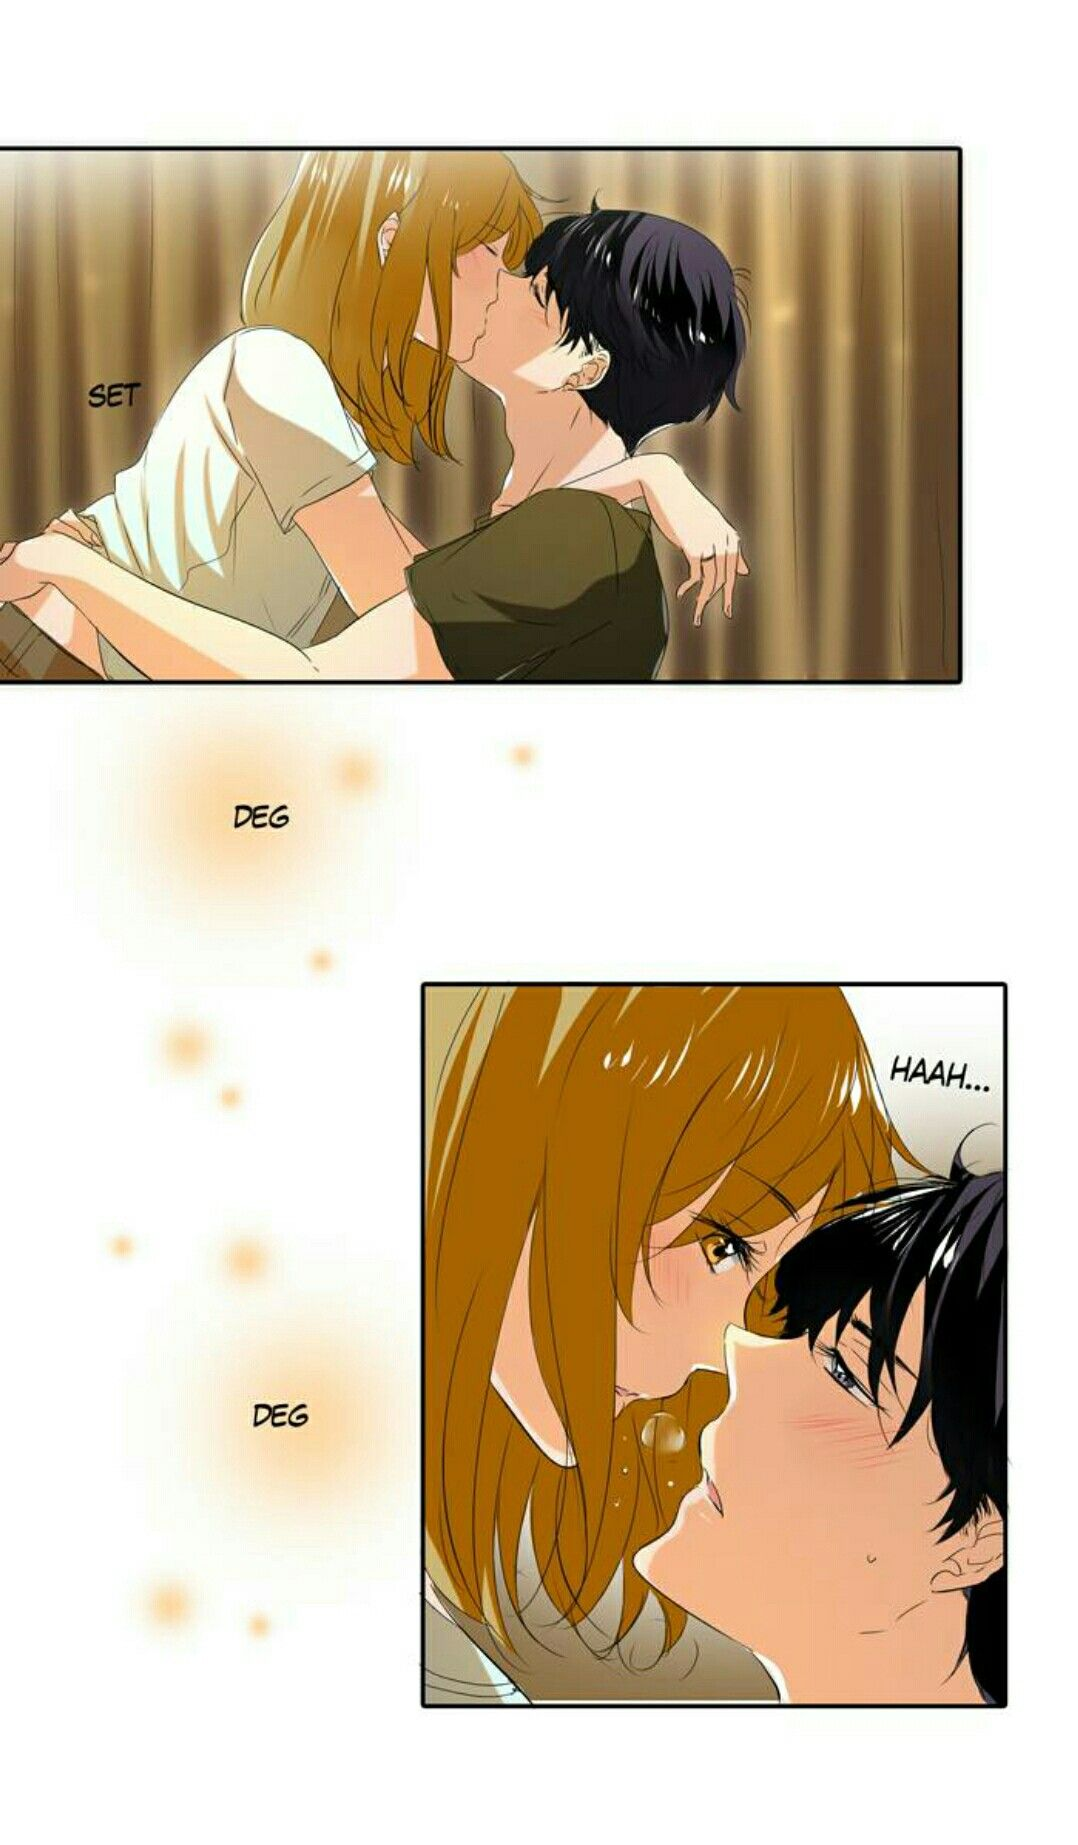 Pin di Anime/Webtoon Couple Pict